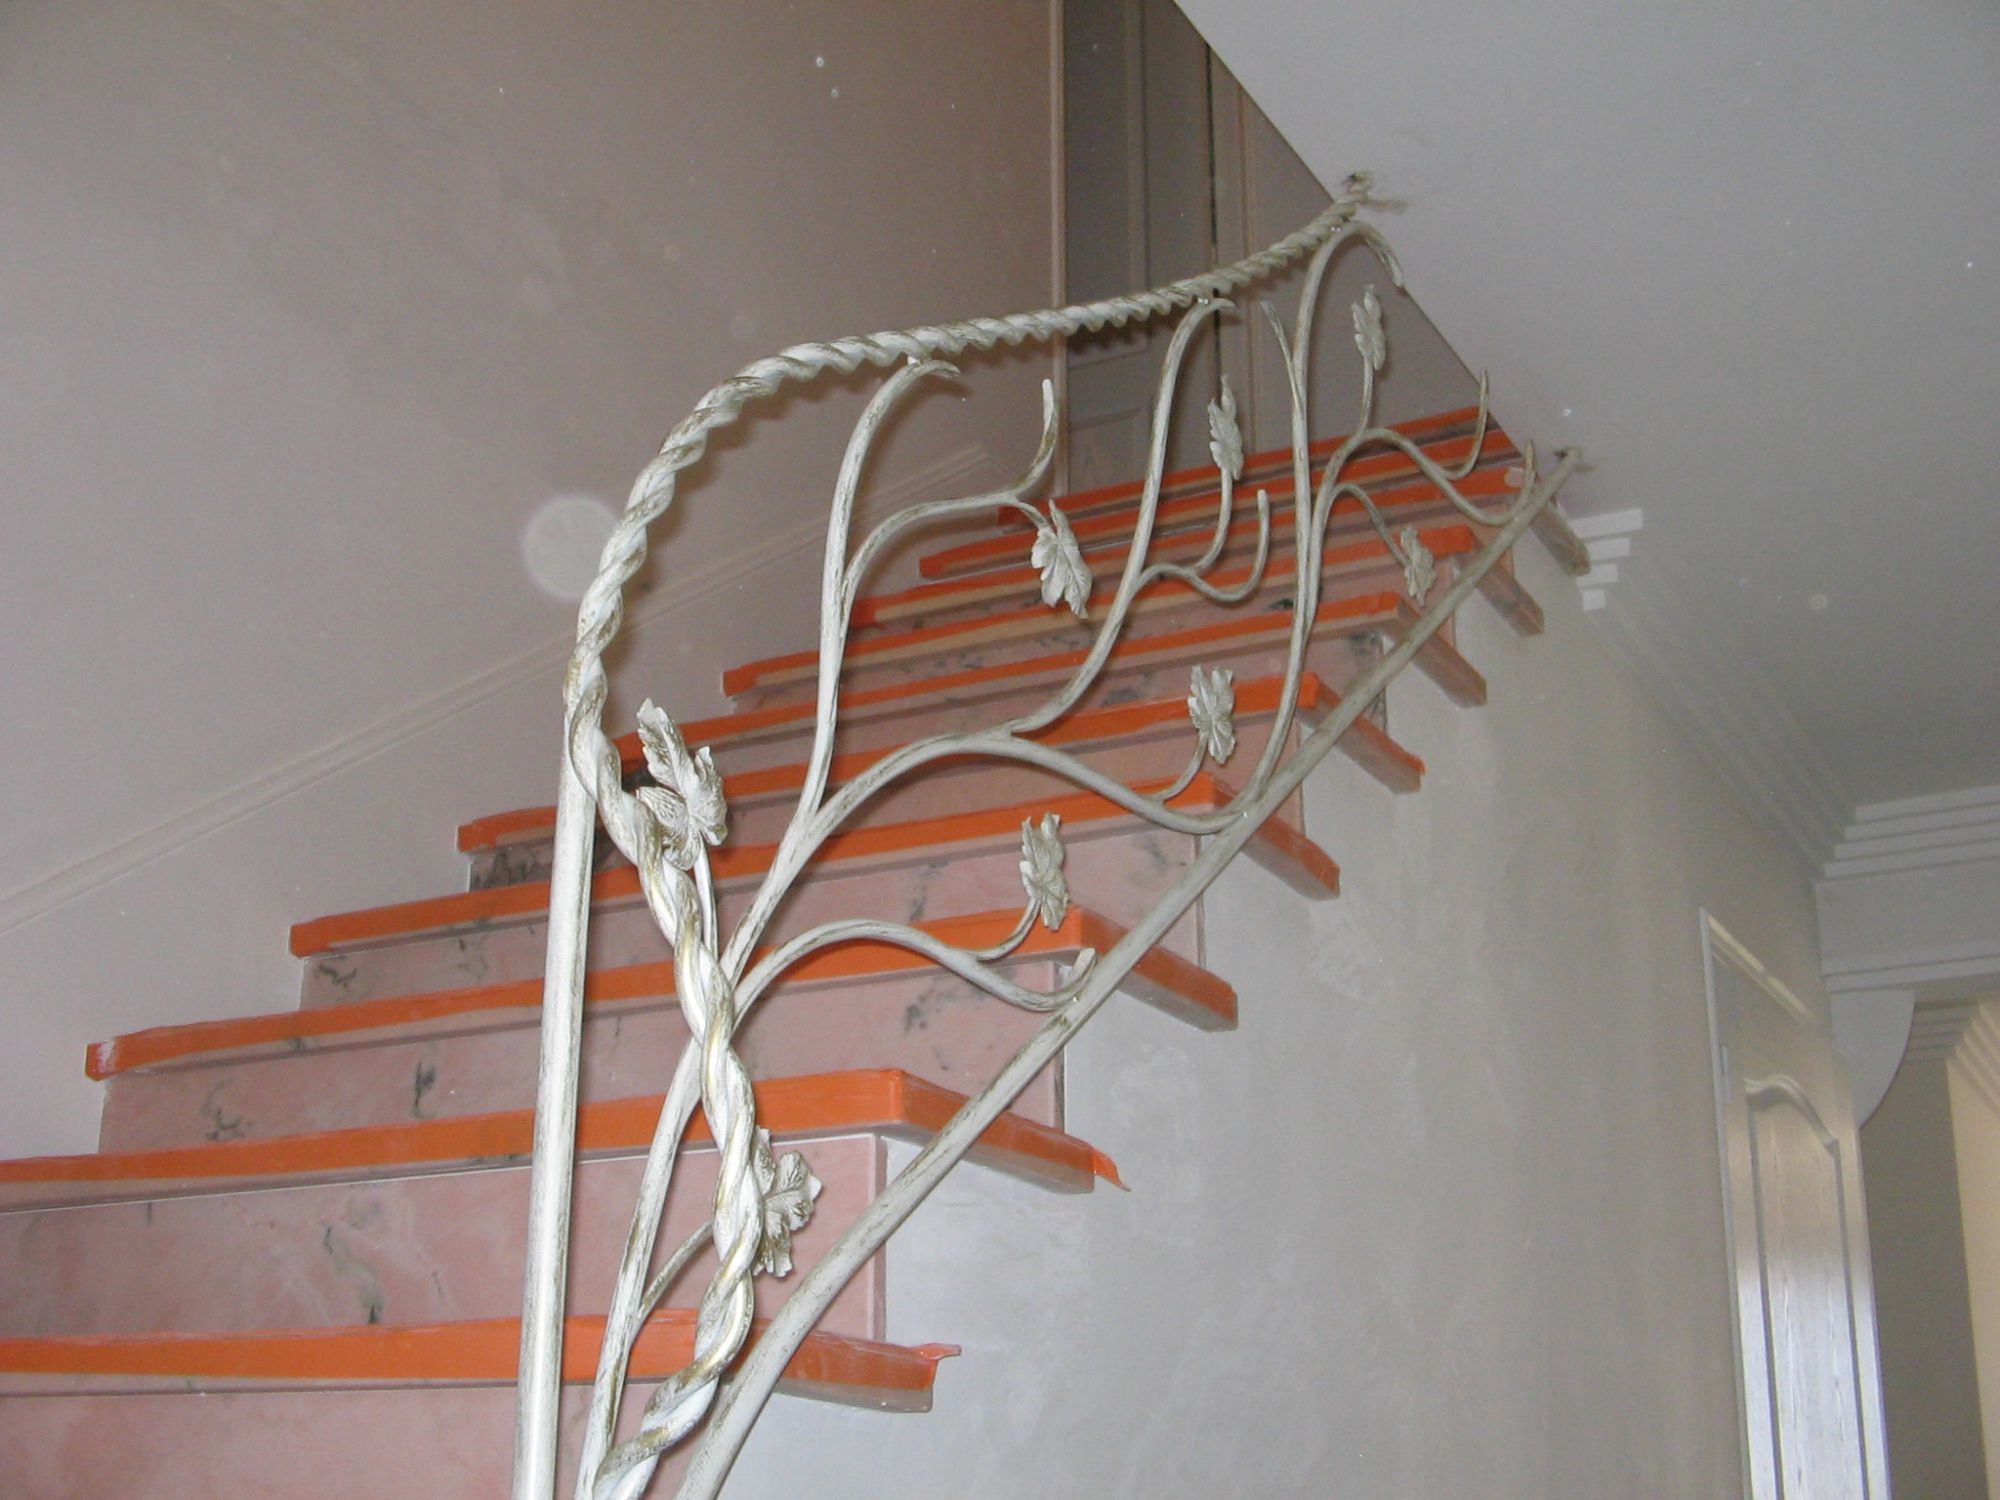 rampe 2 [2]